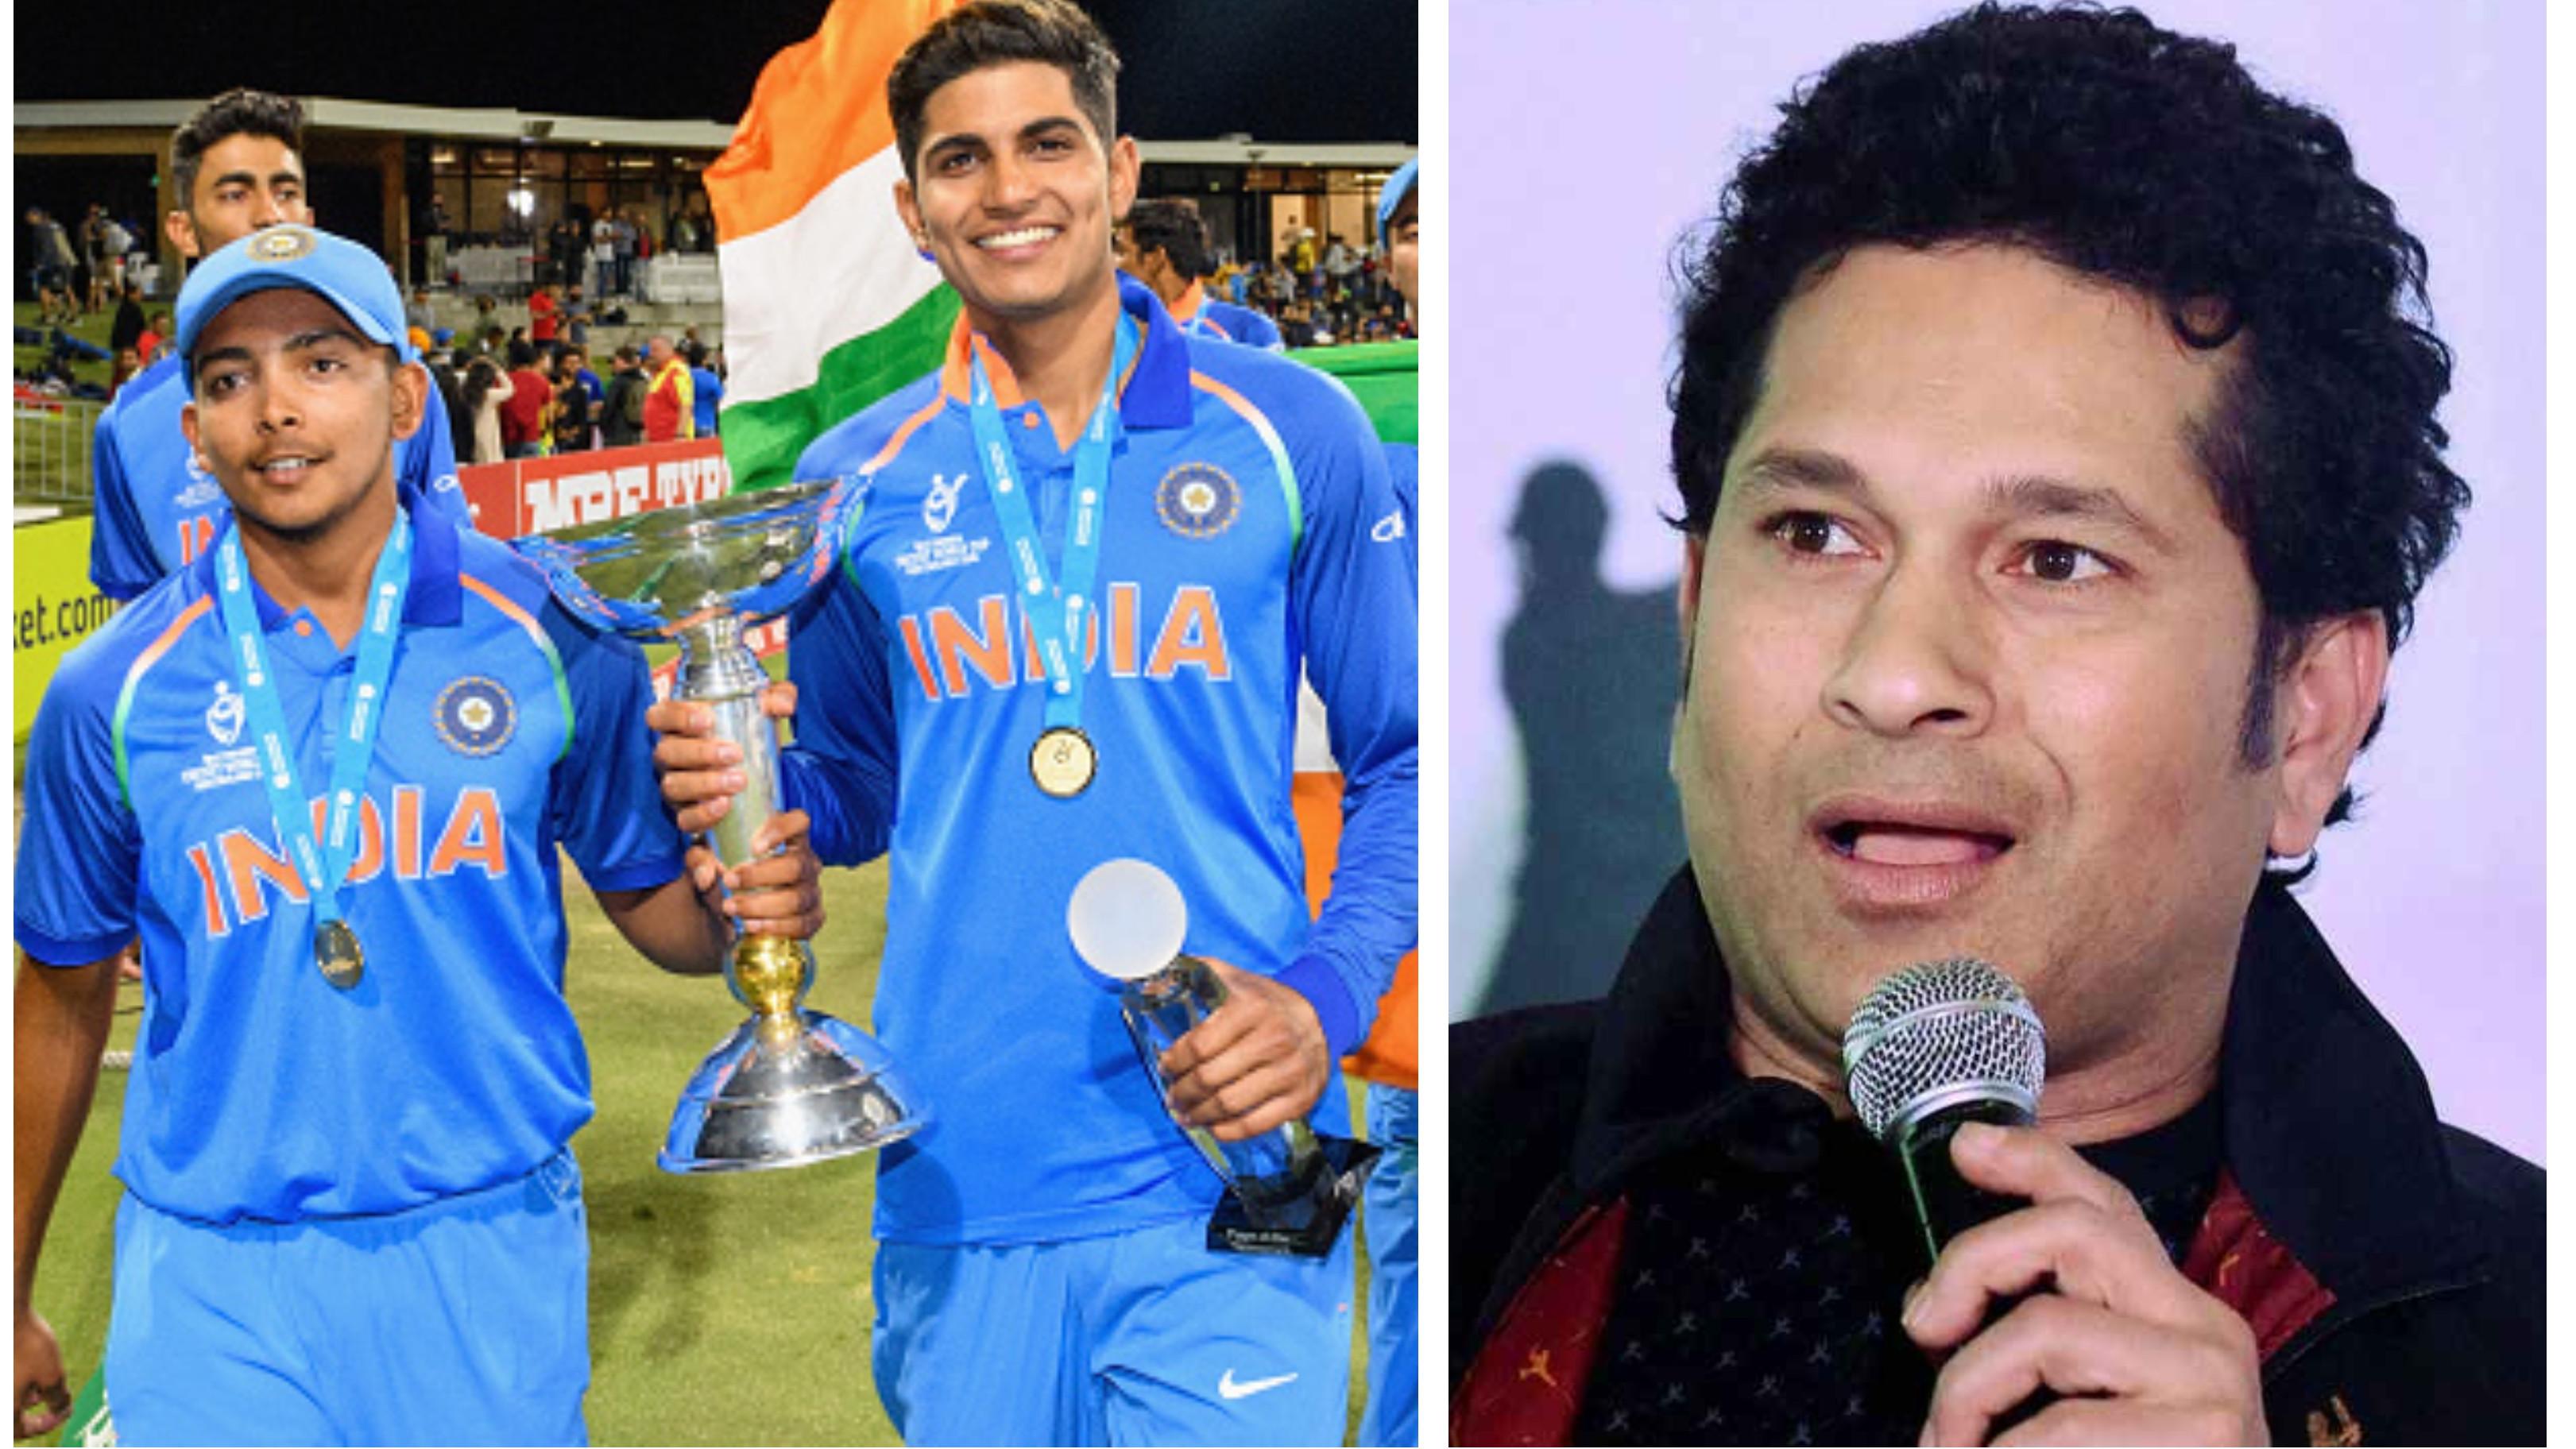 Sachin Tendulkar advices Prithvi Shaw and Shubman Gill to enjoy their cricket